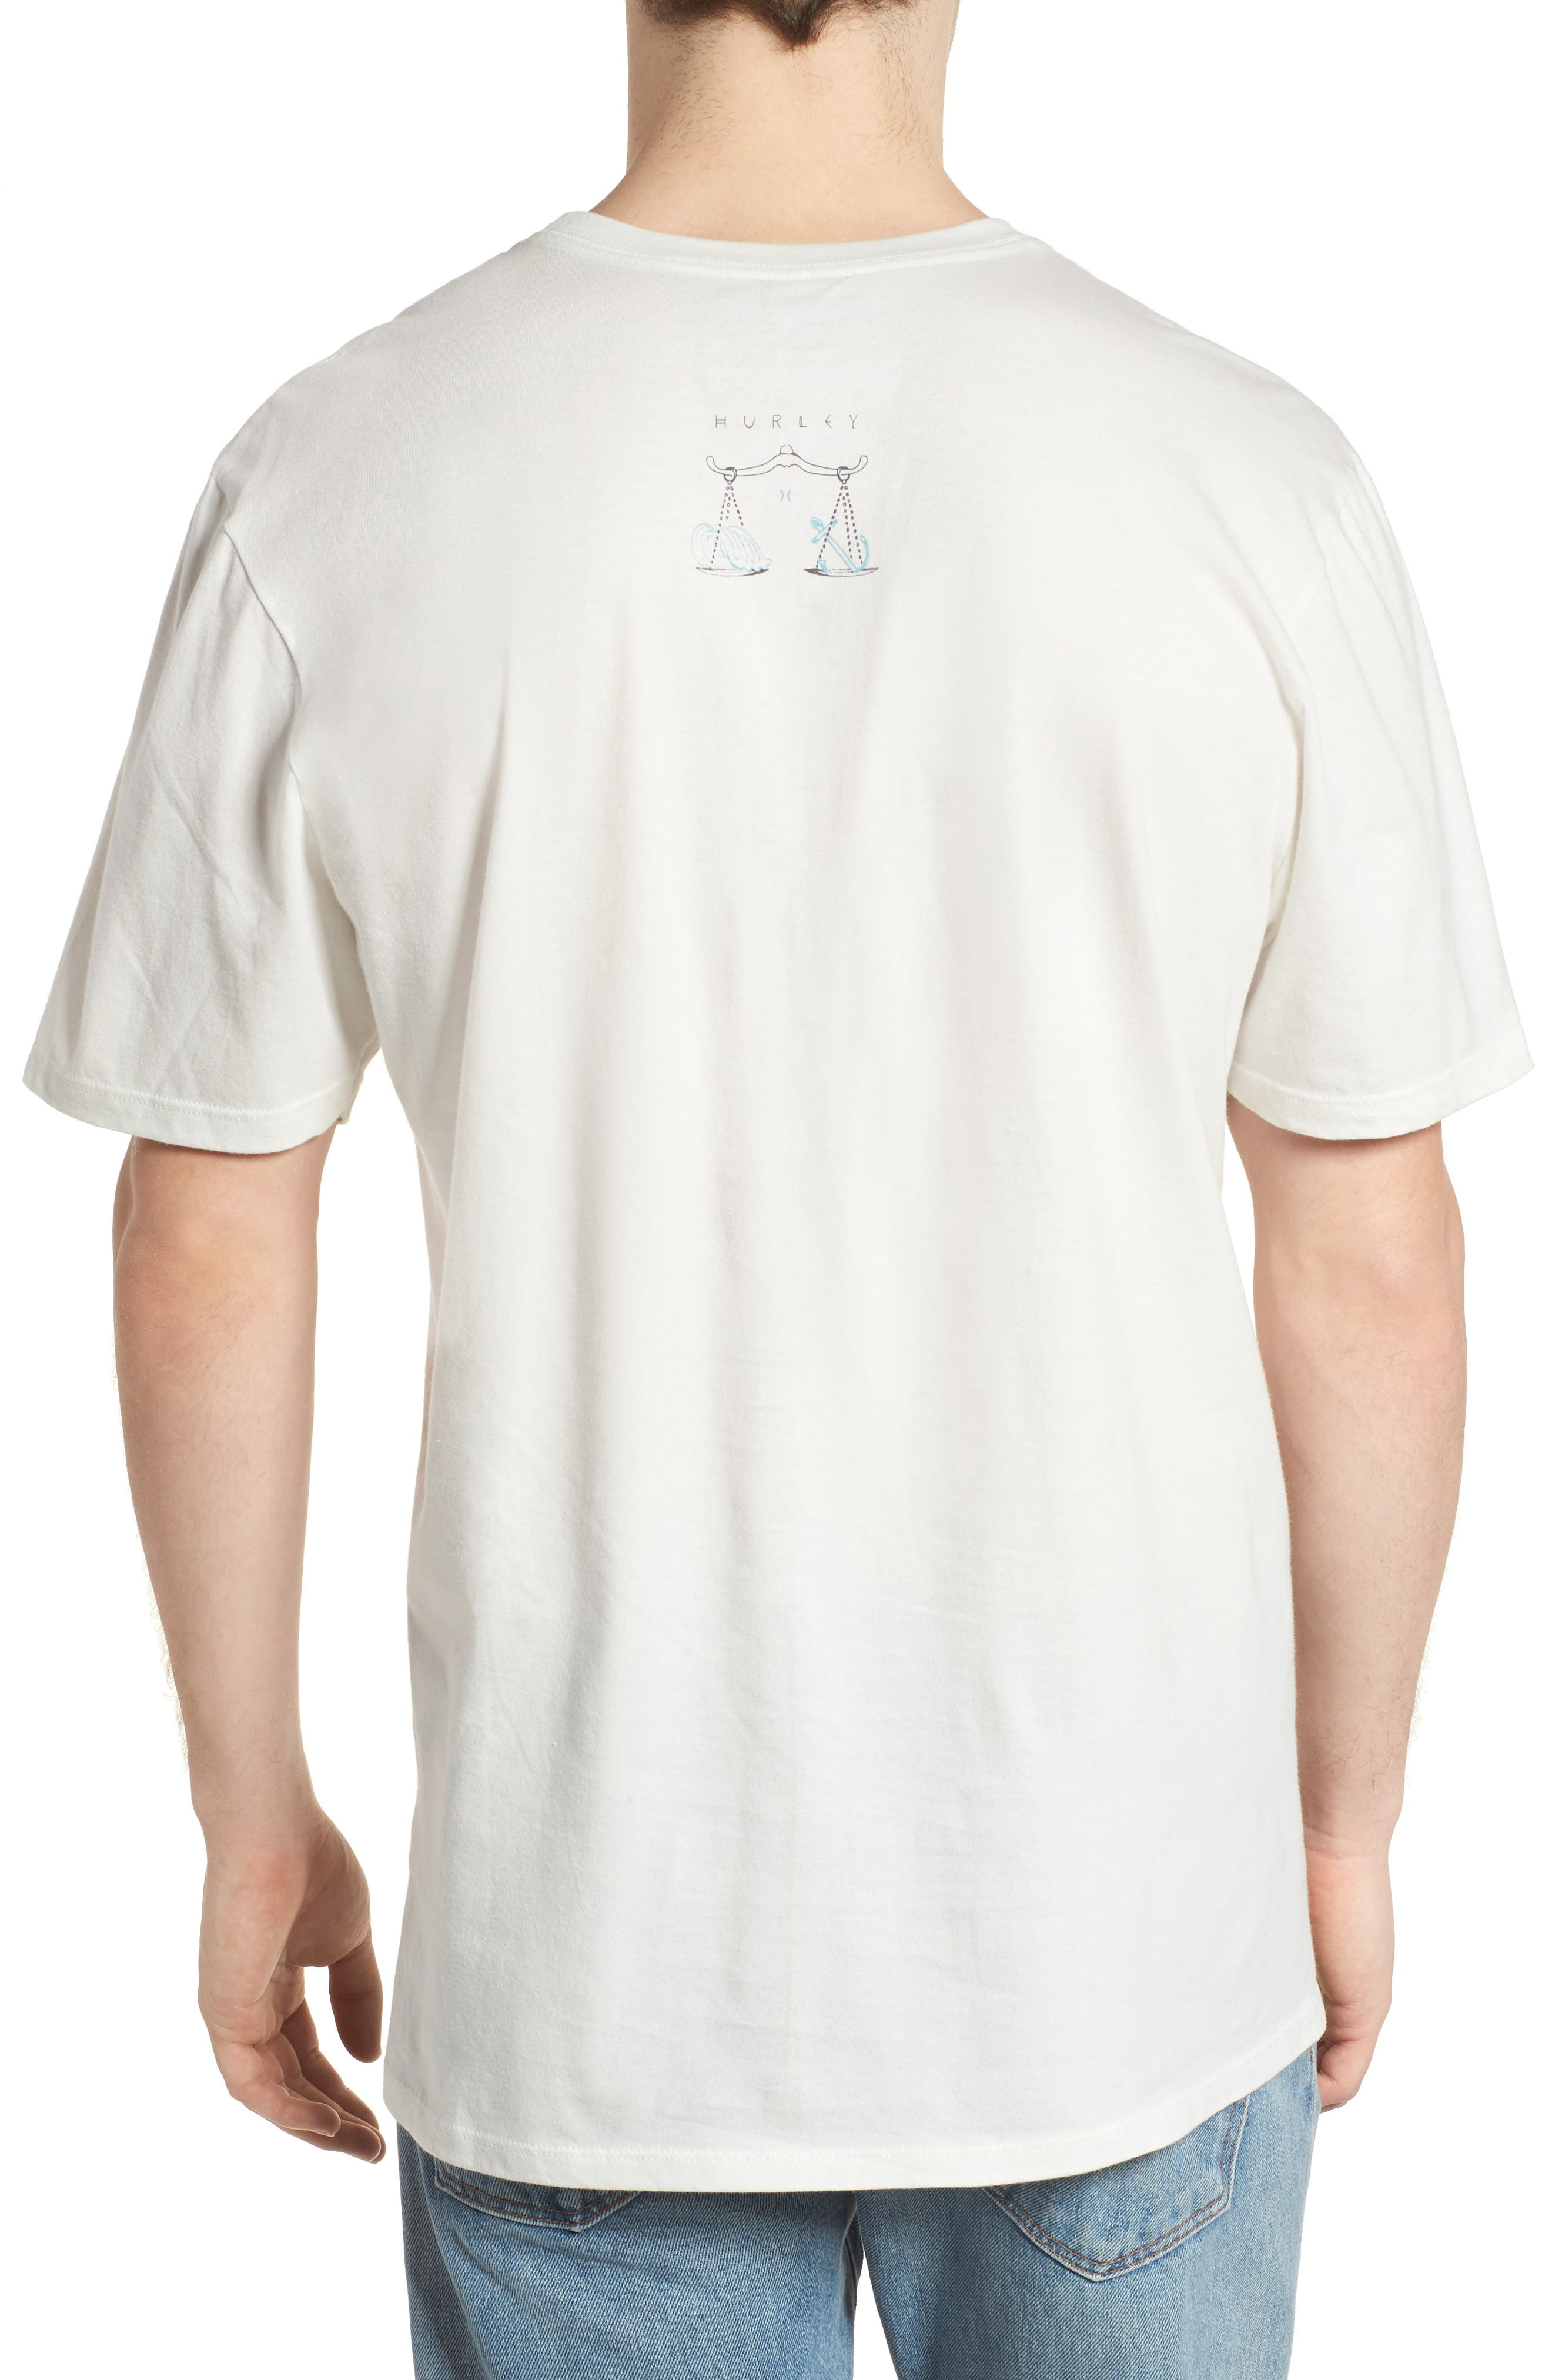 Siren T-Shirt,                             Alternate thumbnail 2, color,                             133